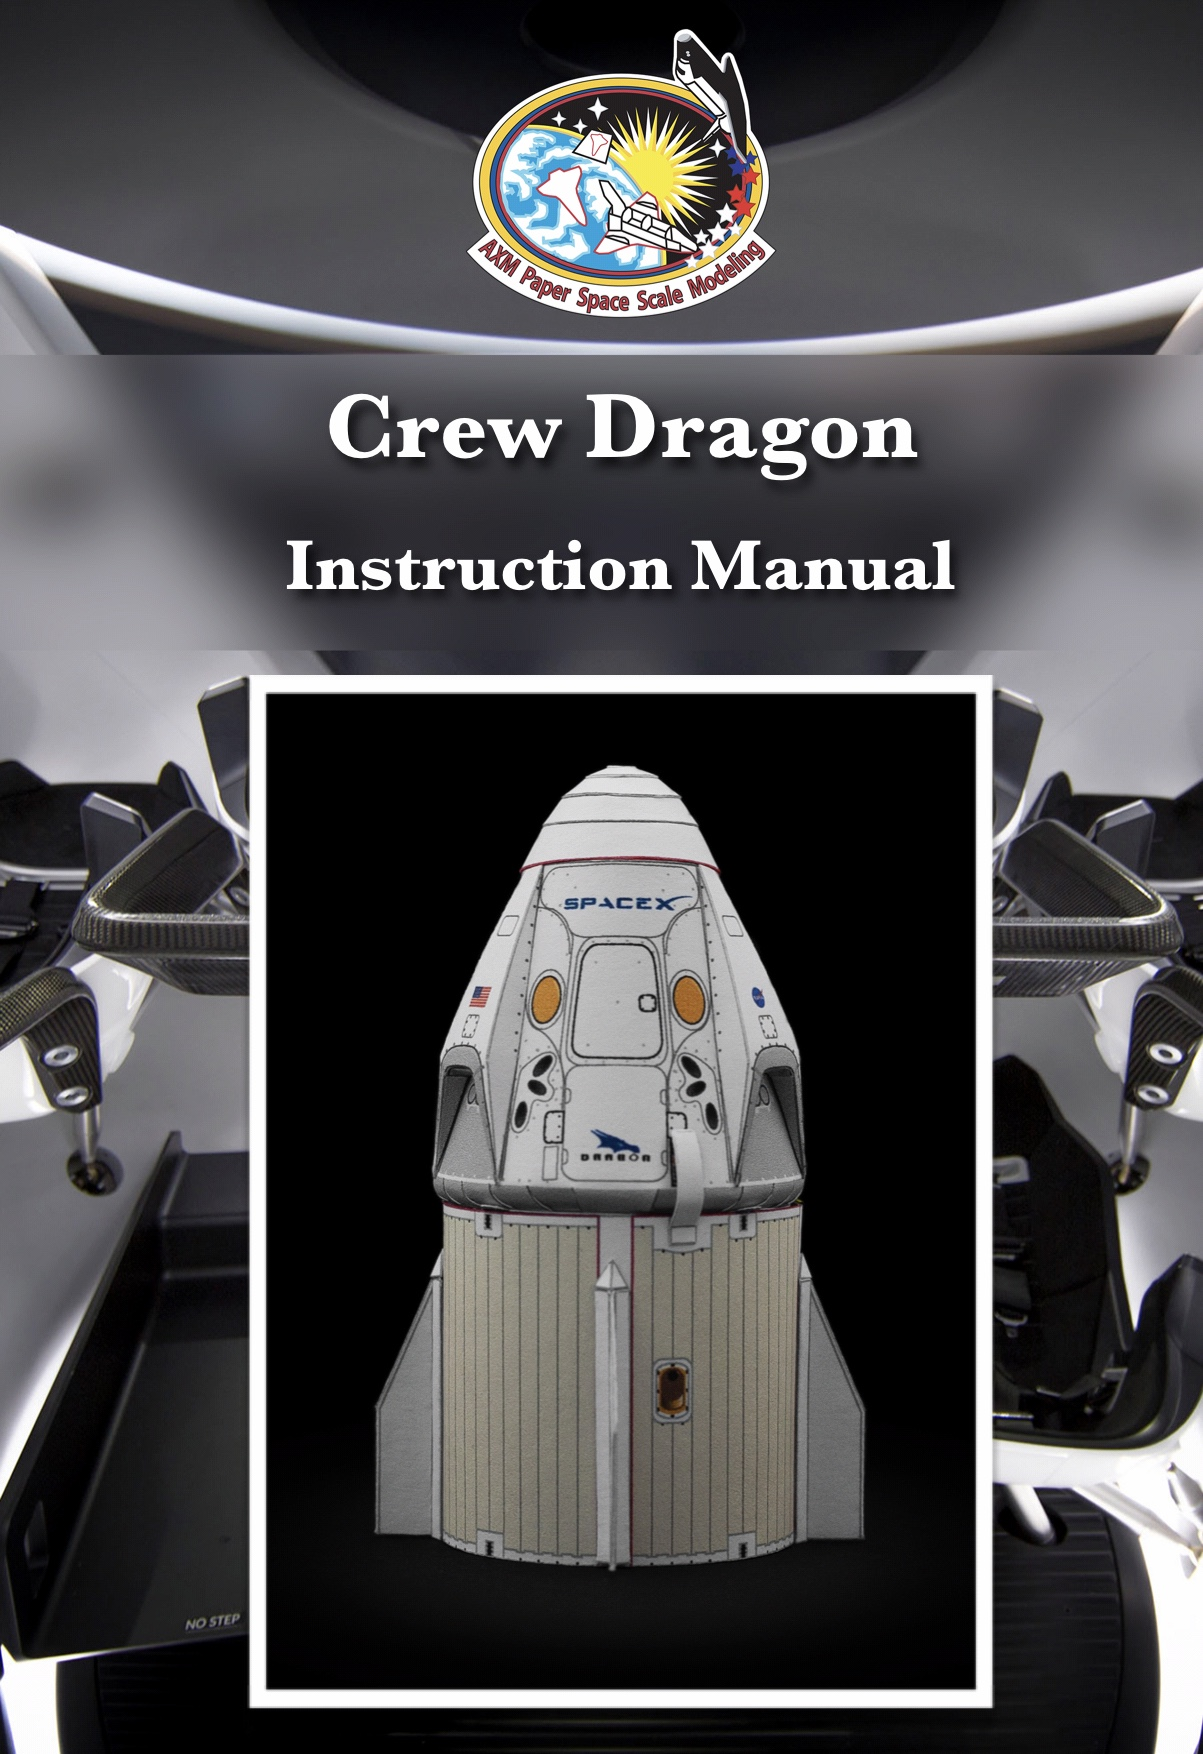 Falcon 9 - AXM Paper Space Scale Models com | Crew Dragon 2 DM1